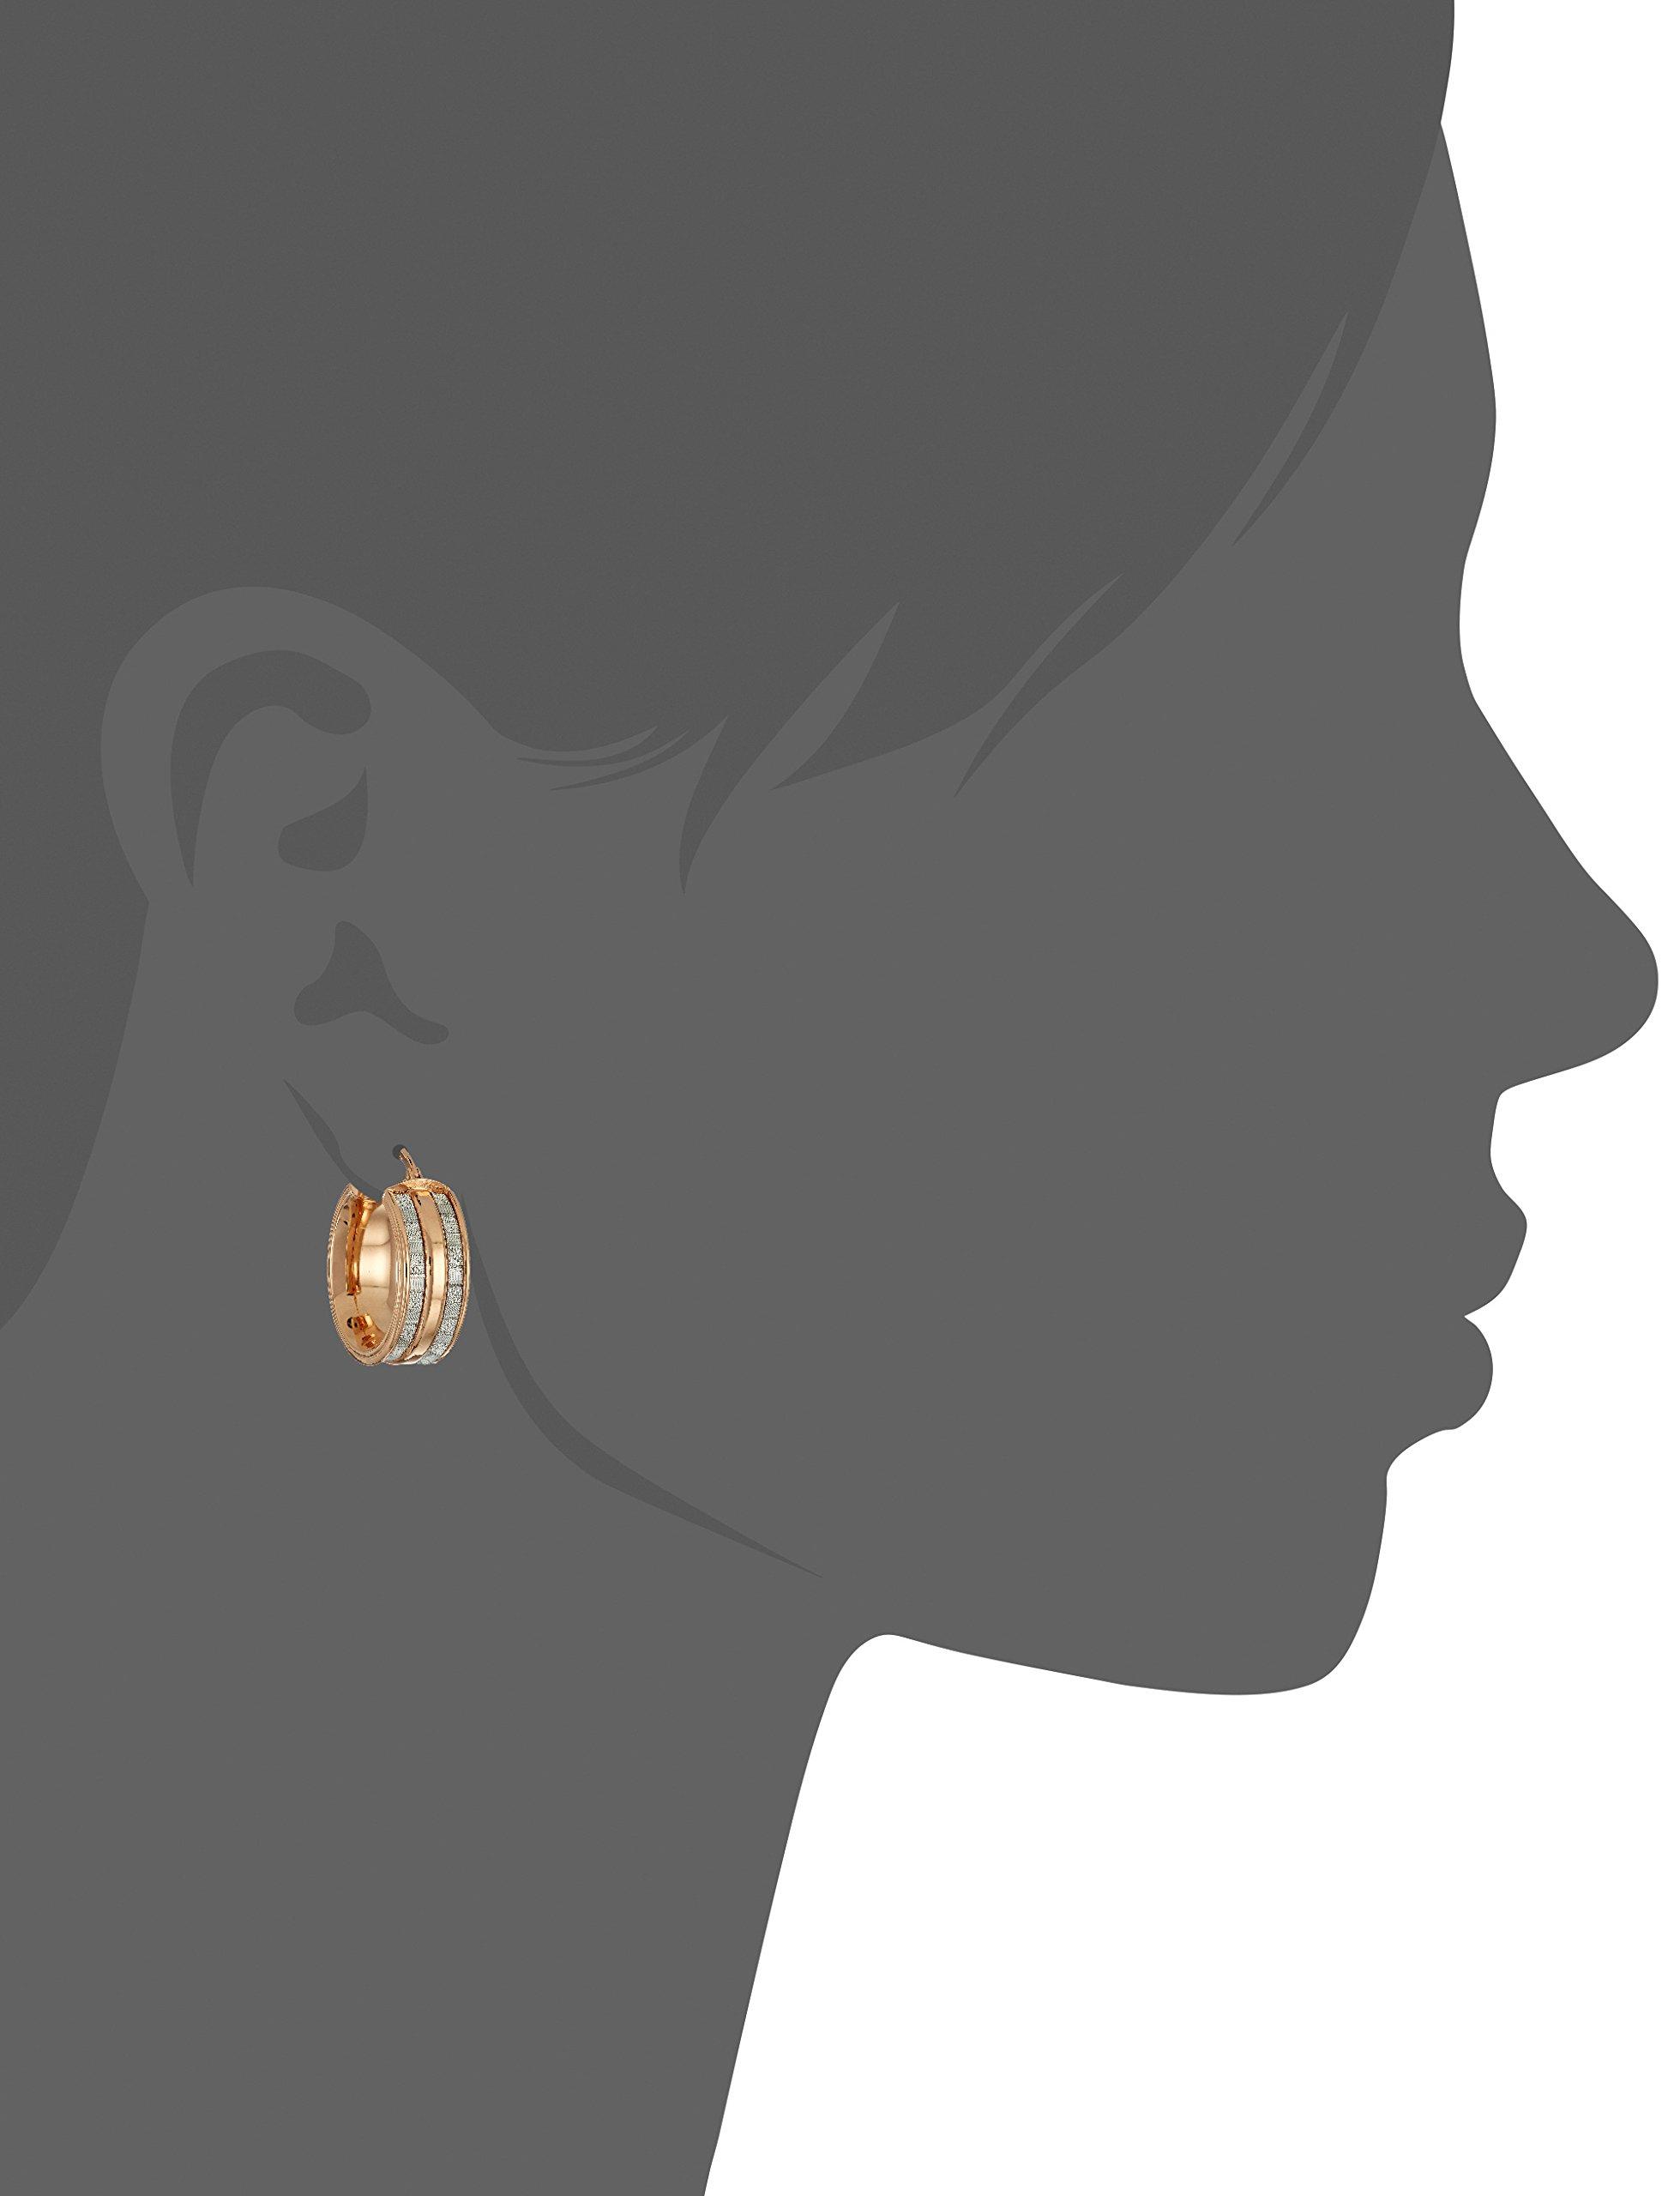 14k Rose Gold Italian Wide Hoop Earrings with Dual Baguette Style Glitter Strips Hoop Earrings by Amazon Collection (Image #2)